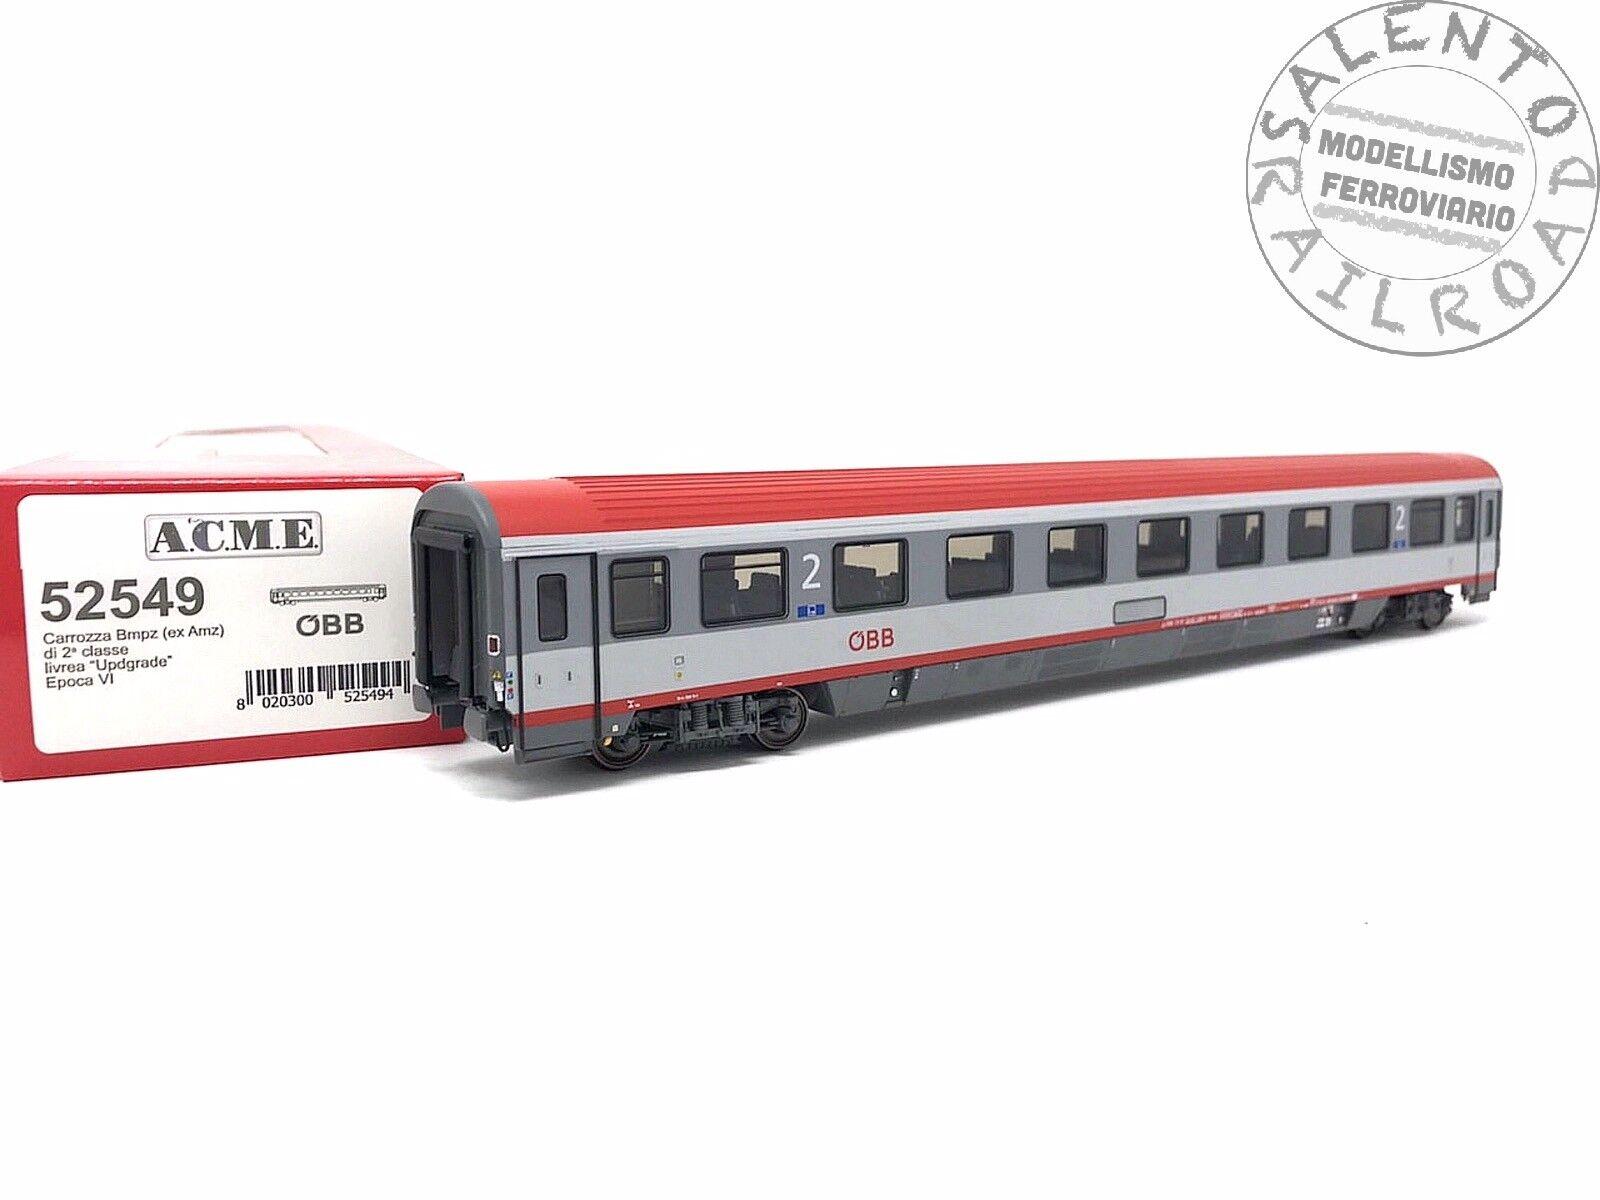 ACME 52549 carrozza passeggeri OBB EC89 a salone Bmpz 2° classe ep VI